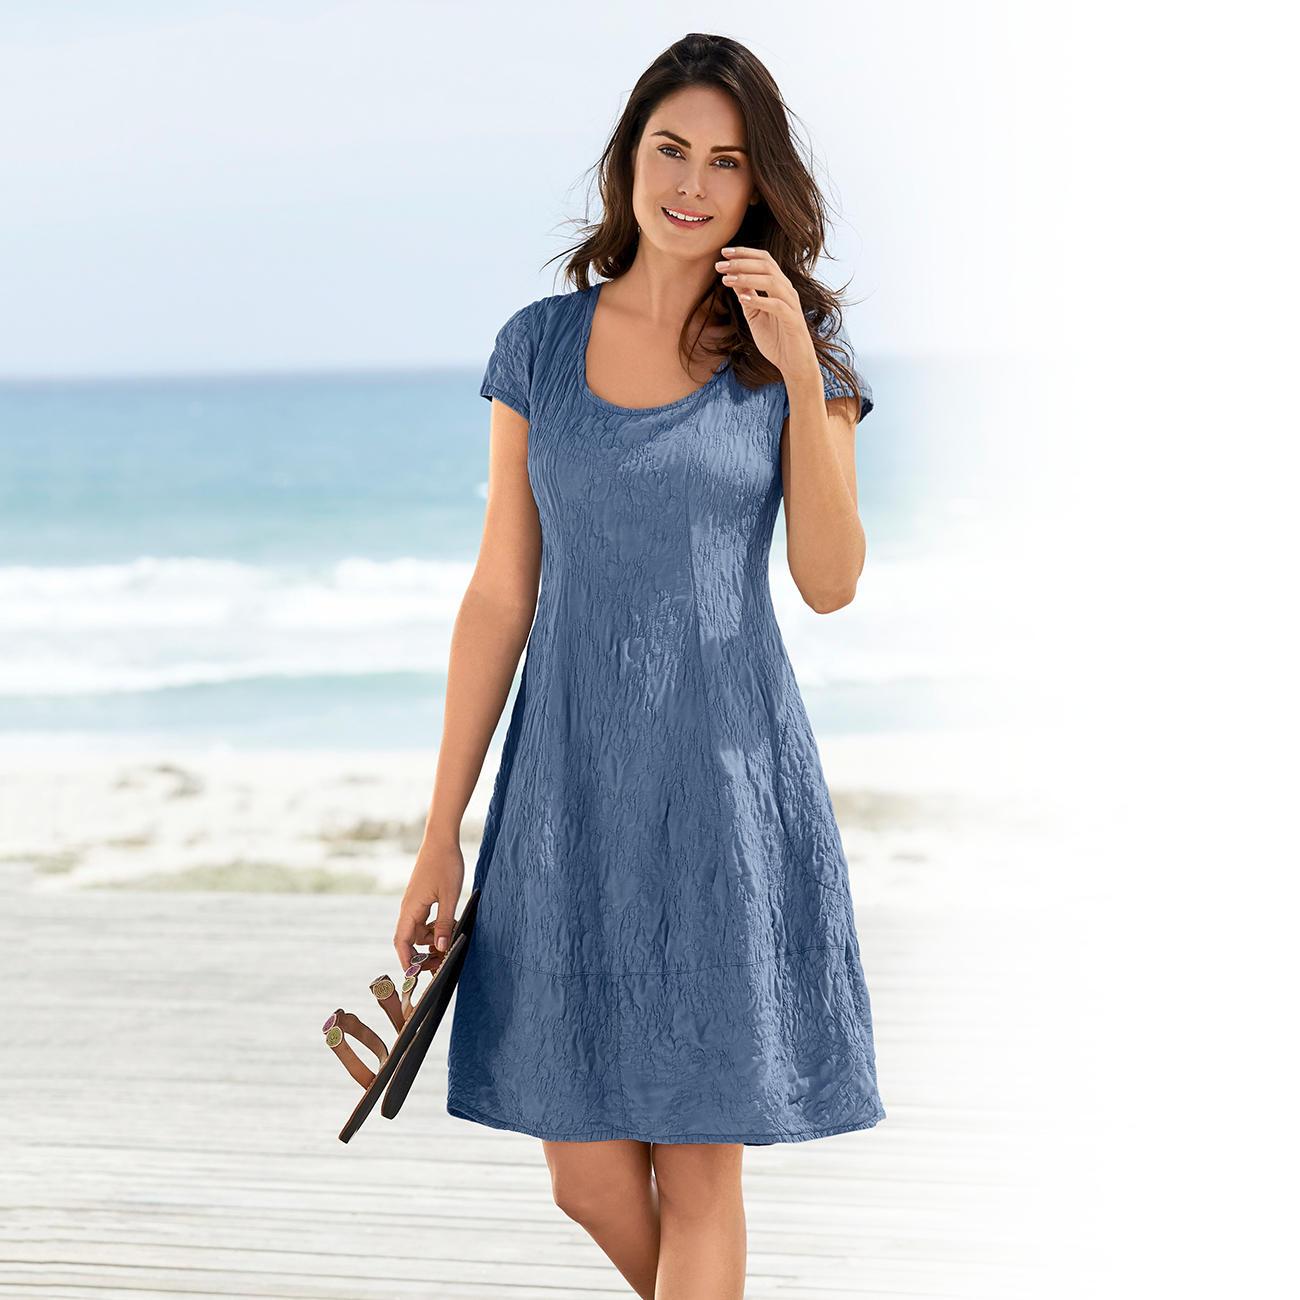 Seidencrash Sommerkleid Mode Klassiker Entdecken